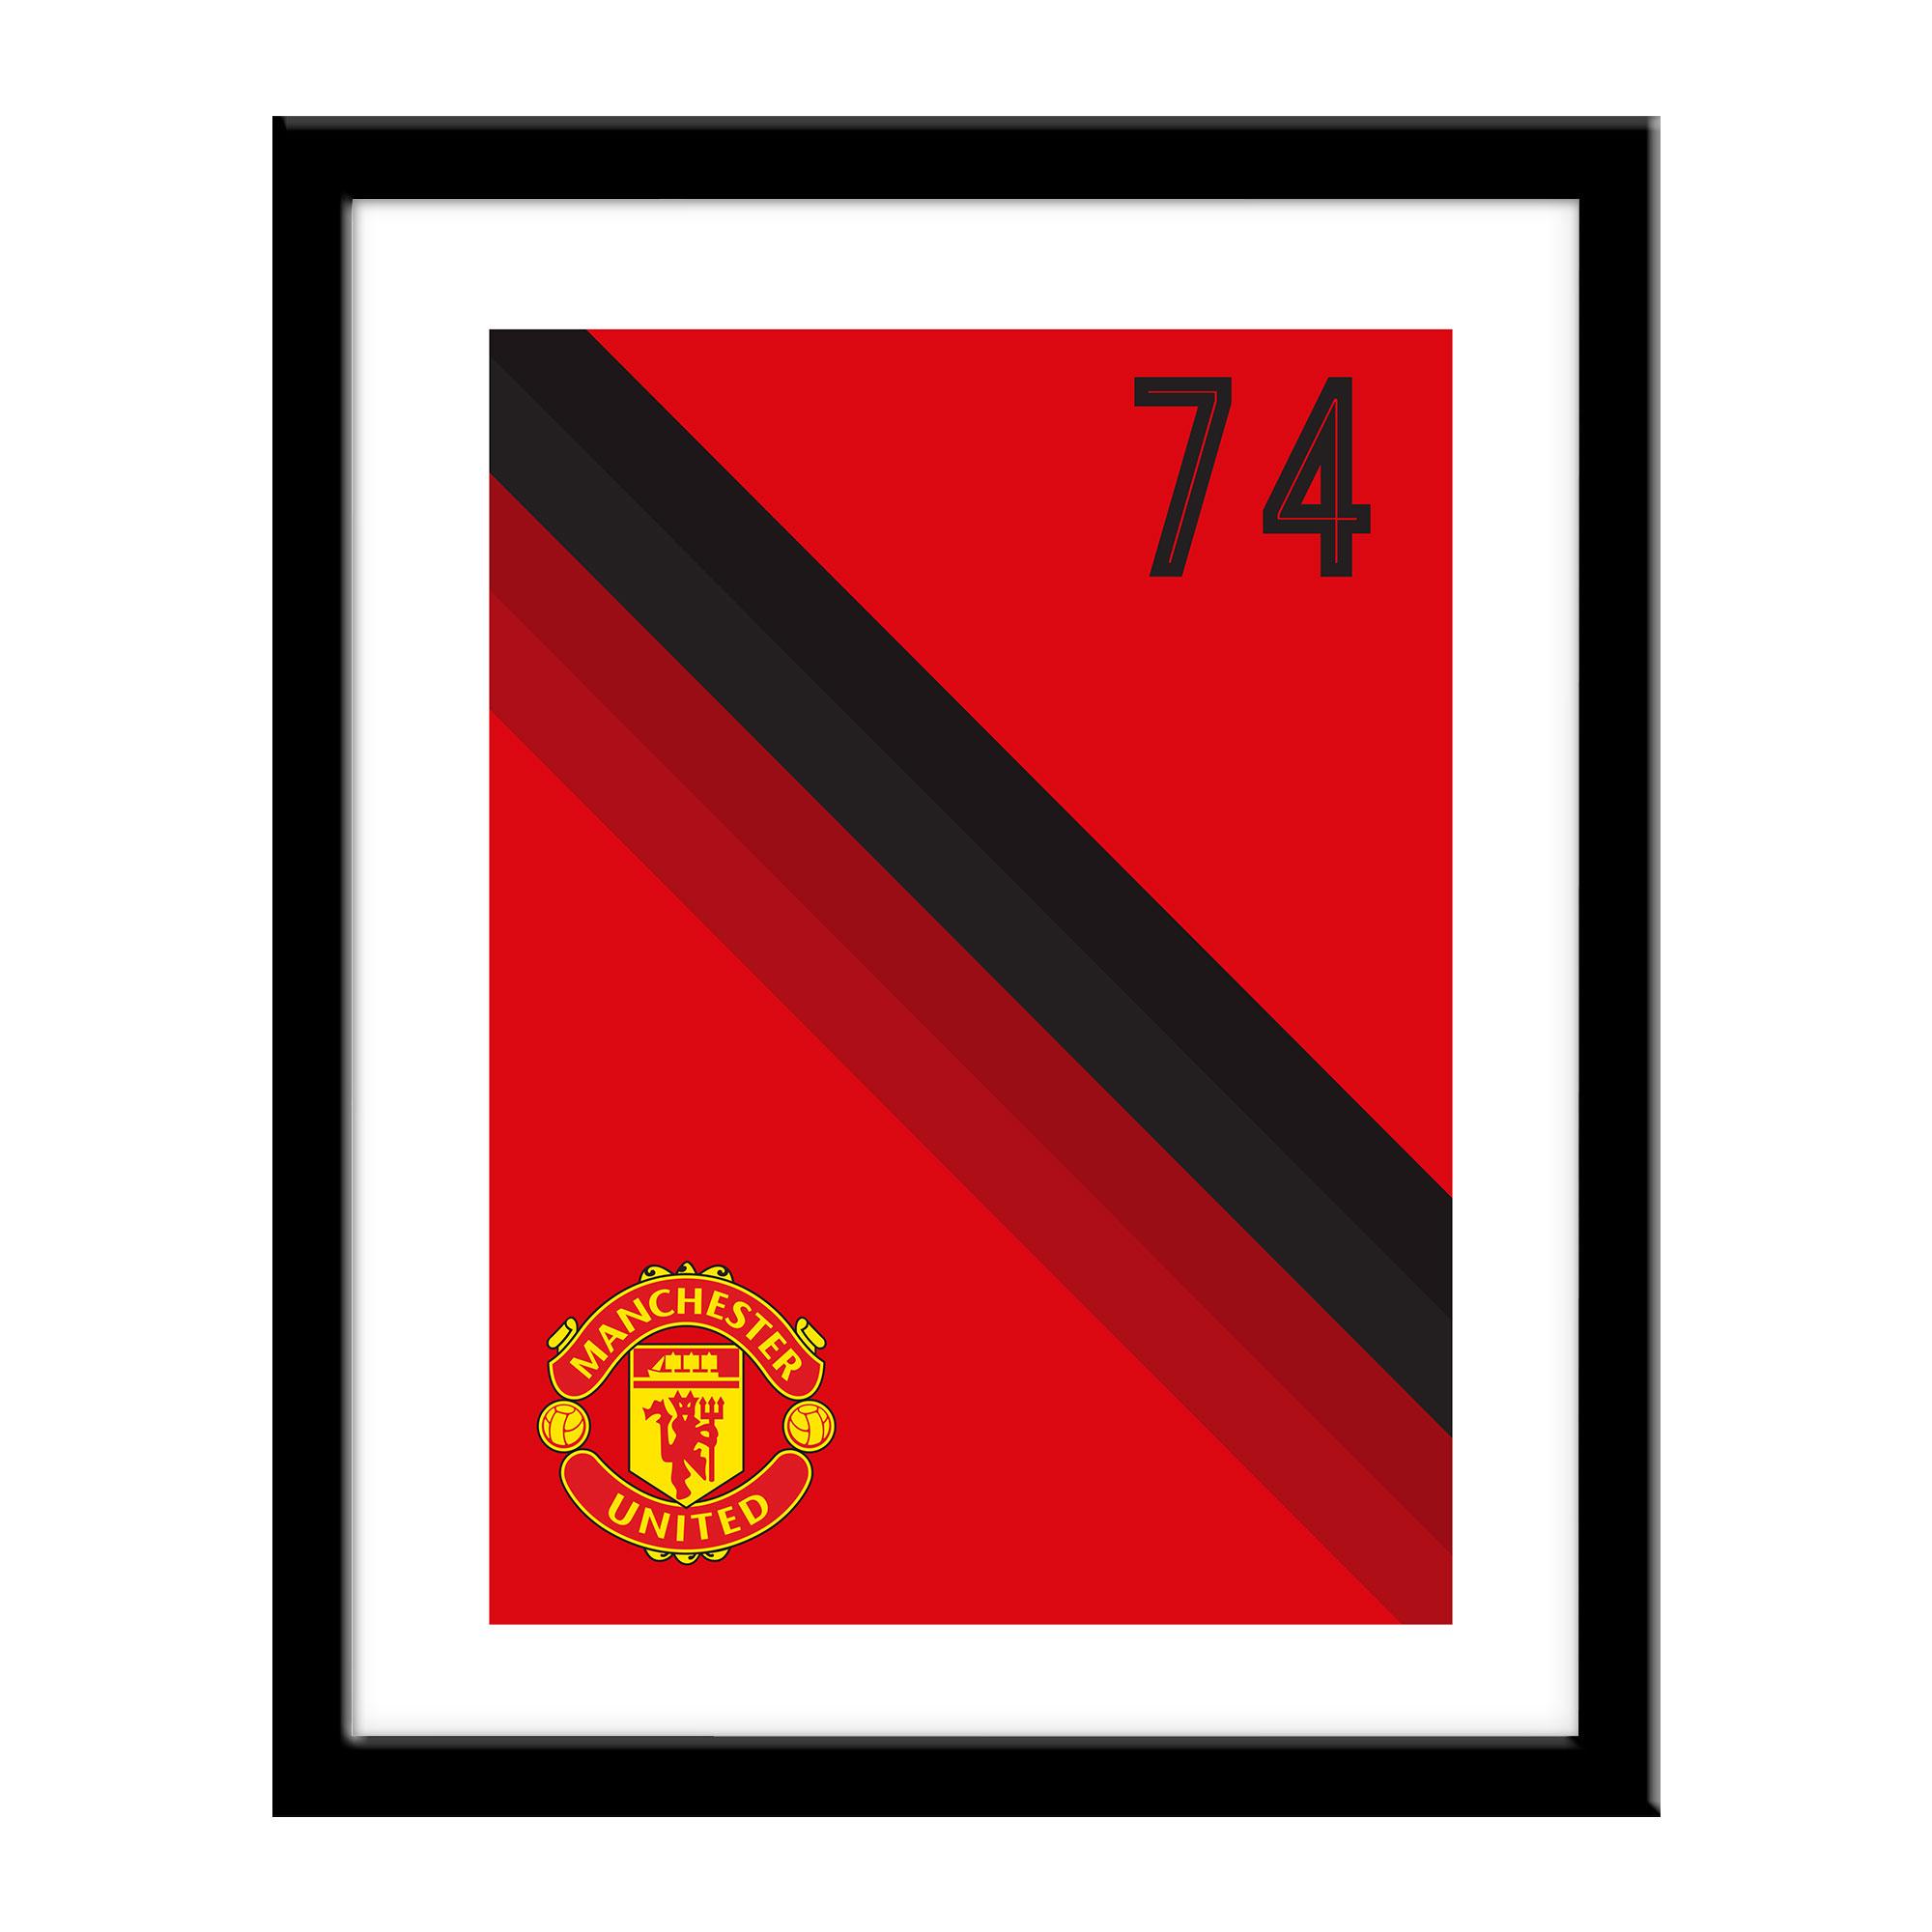 Cartel con franja del Manchester United